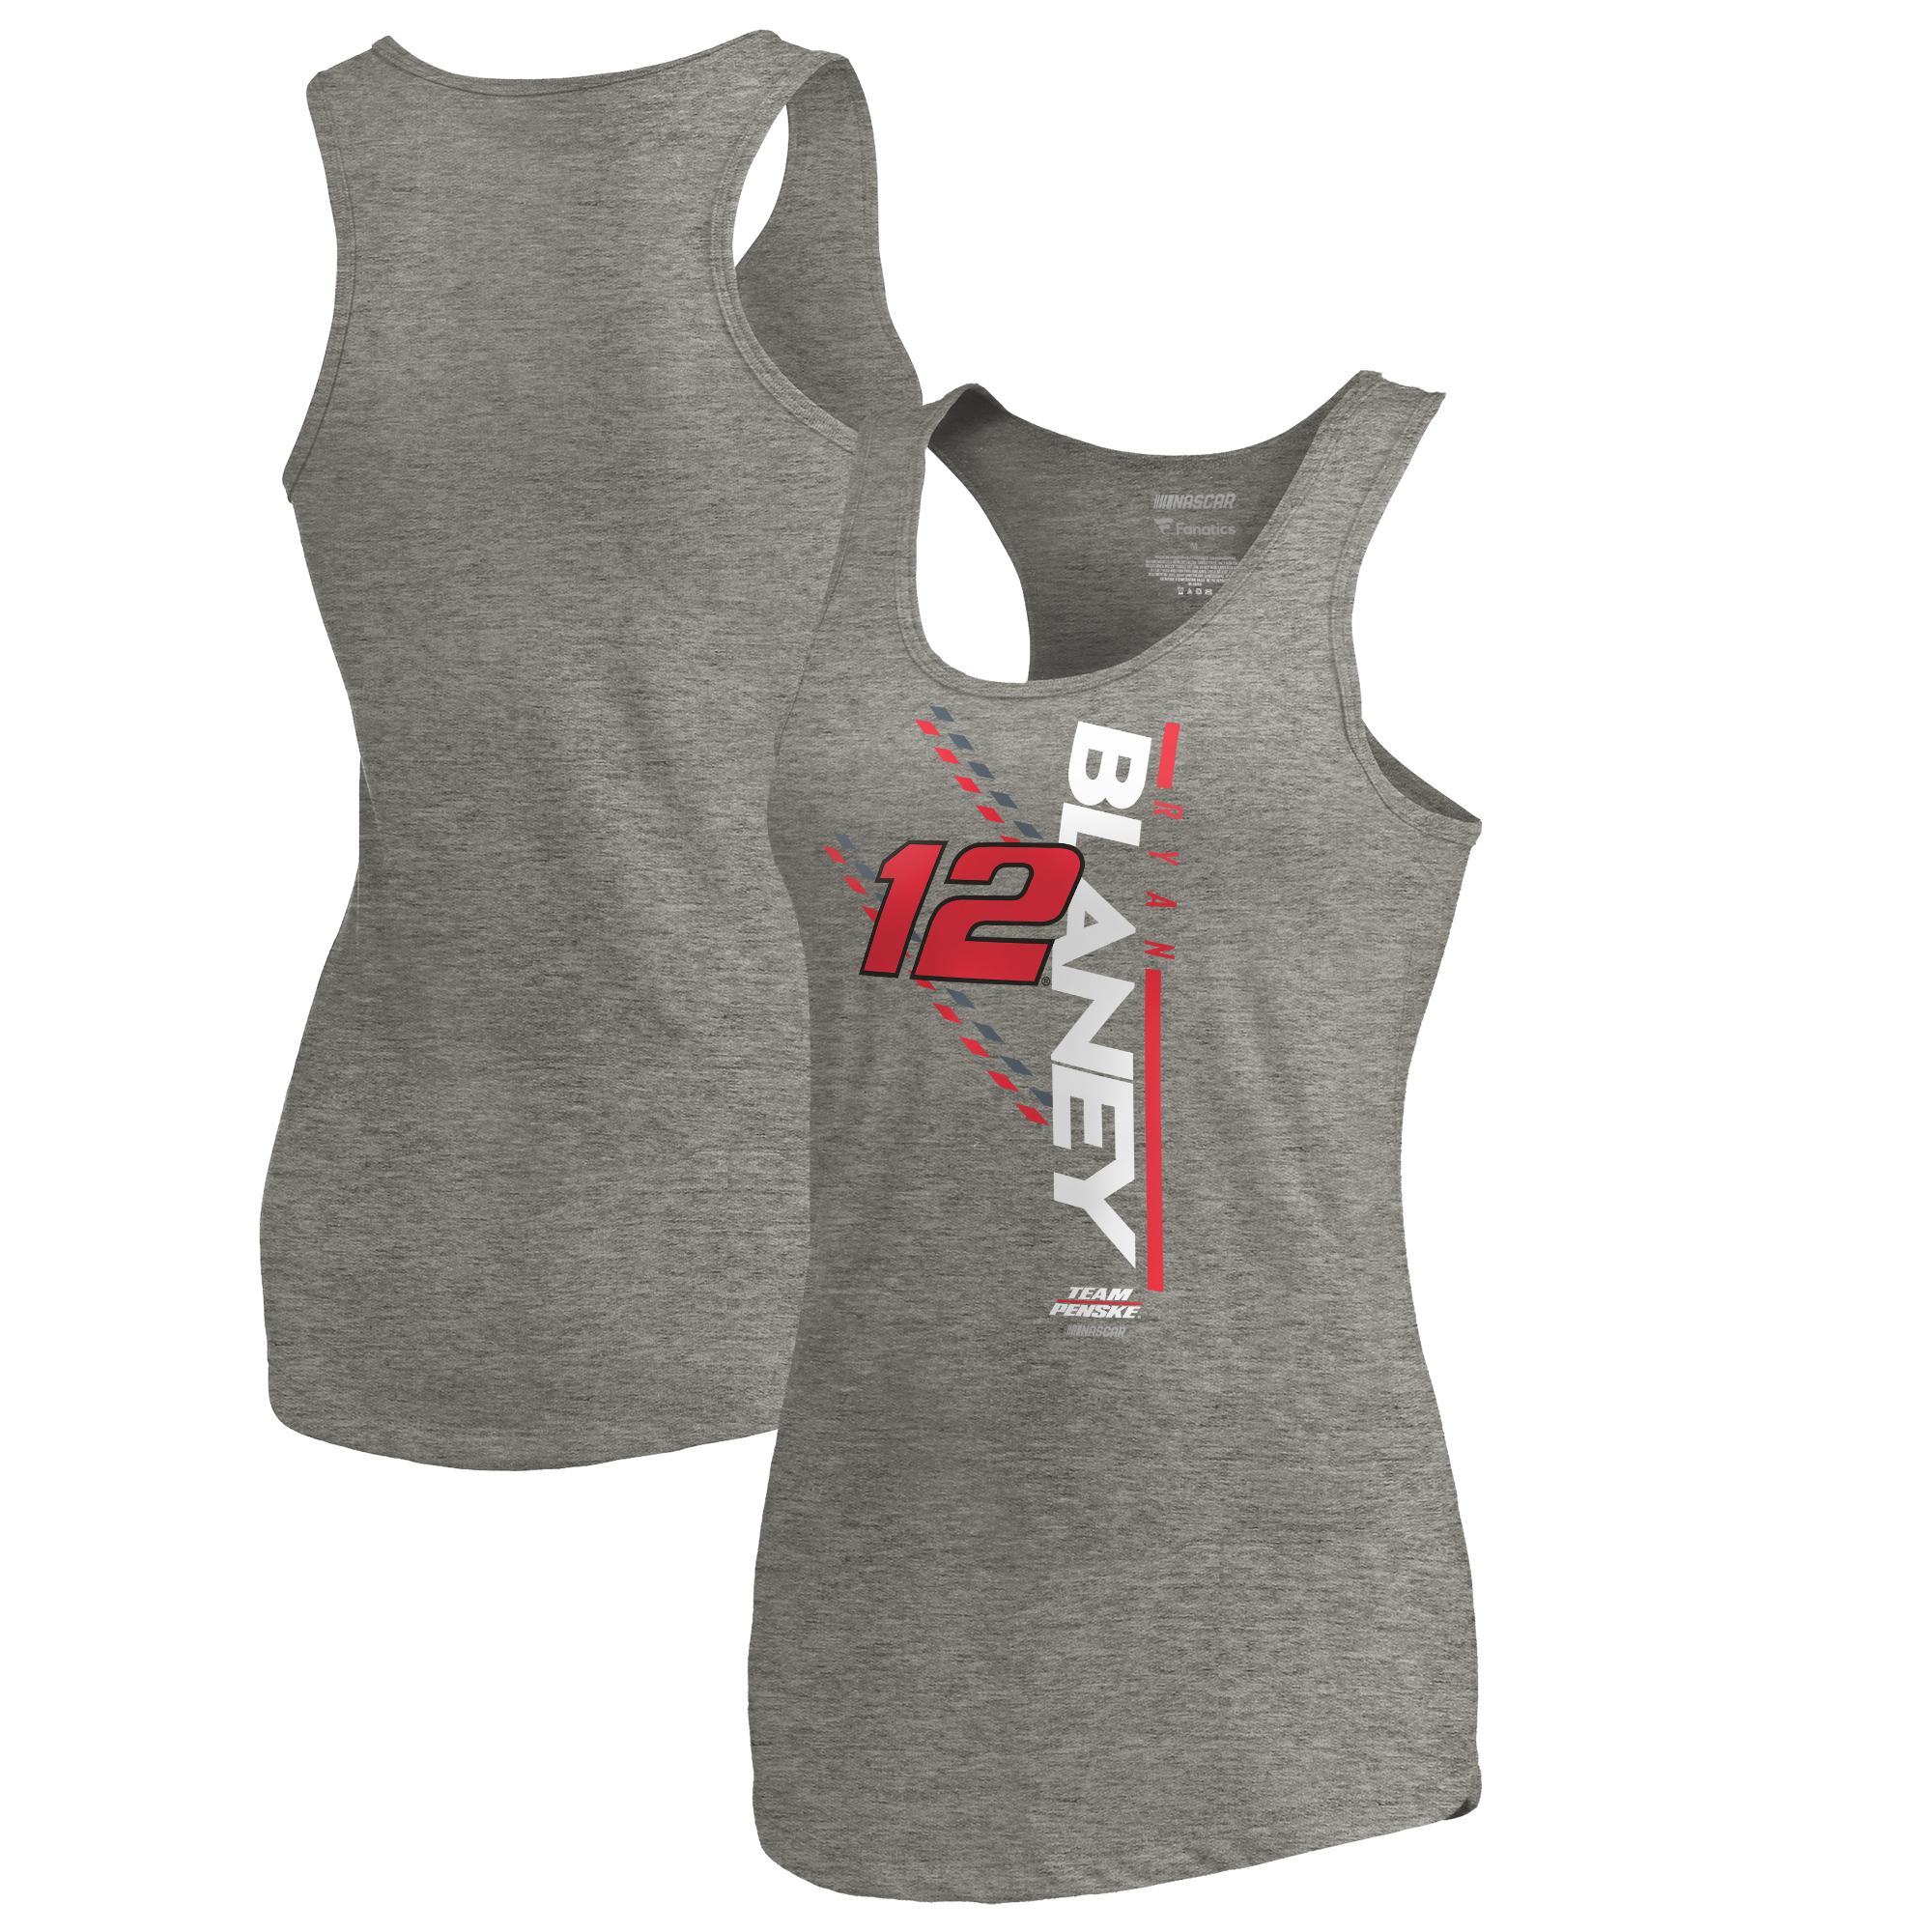 Ryan Blaney Fanatics Branded Women's NASCAR Track Bar Tri-Blend Tank Top - Heathered Gray